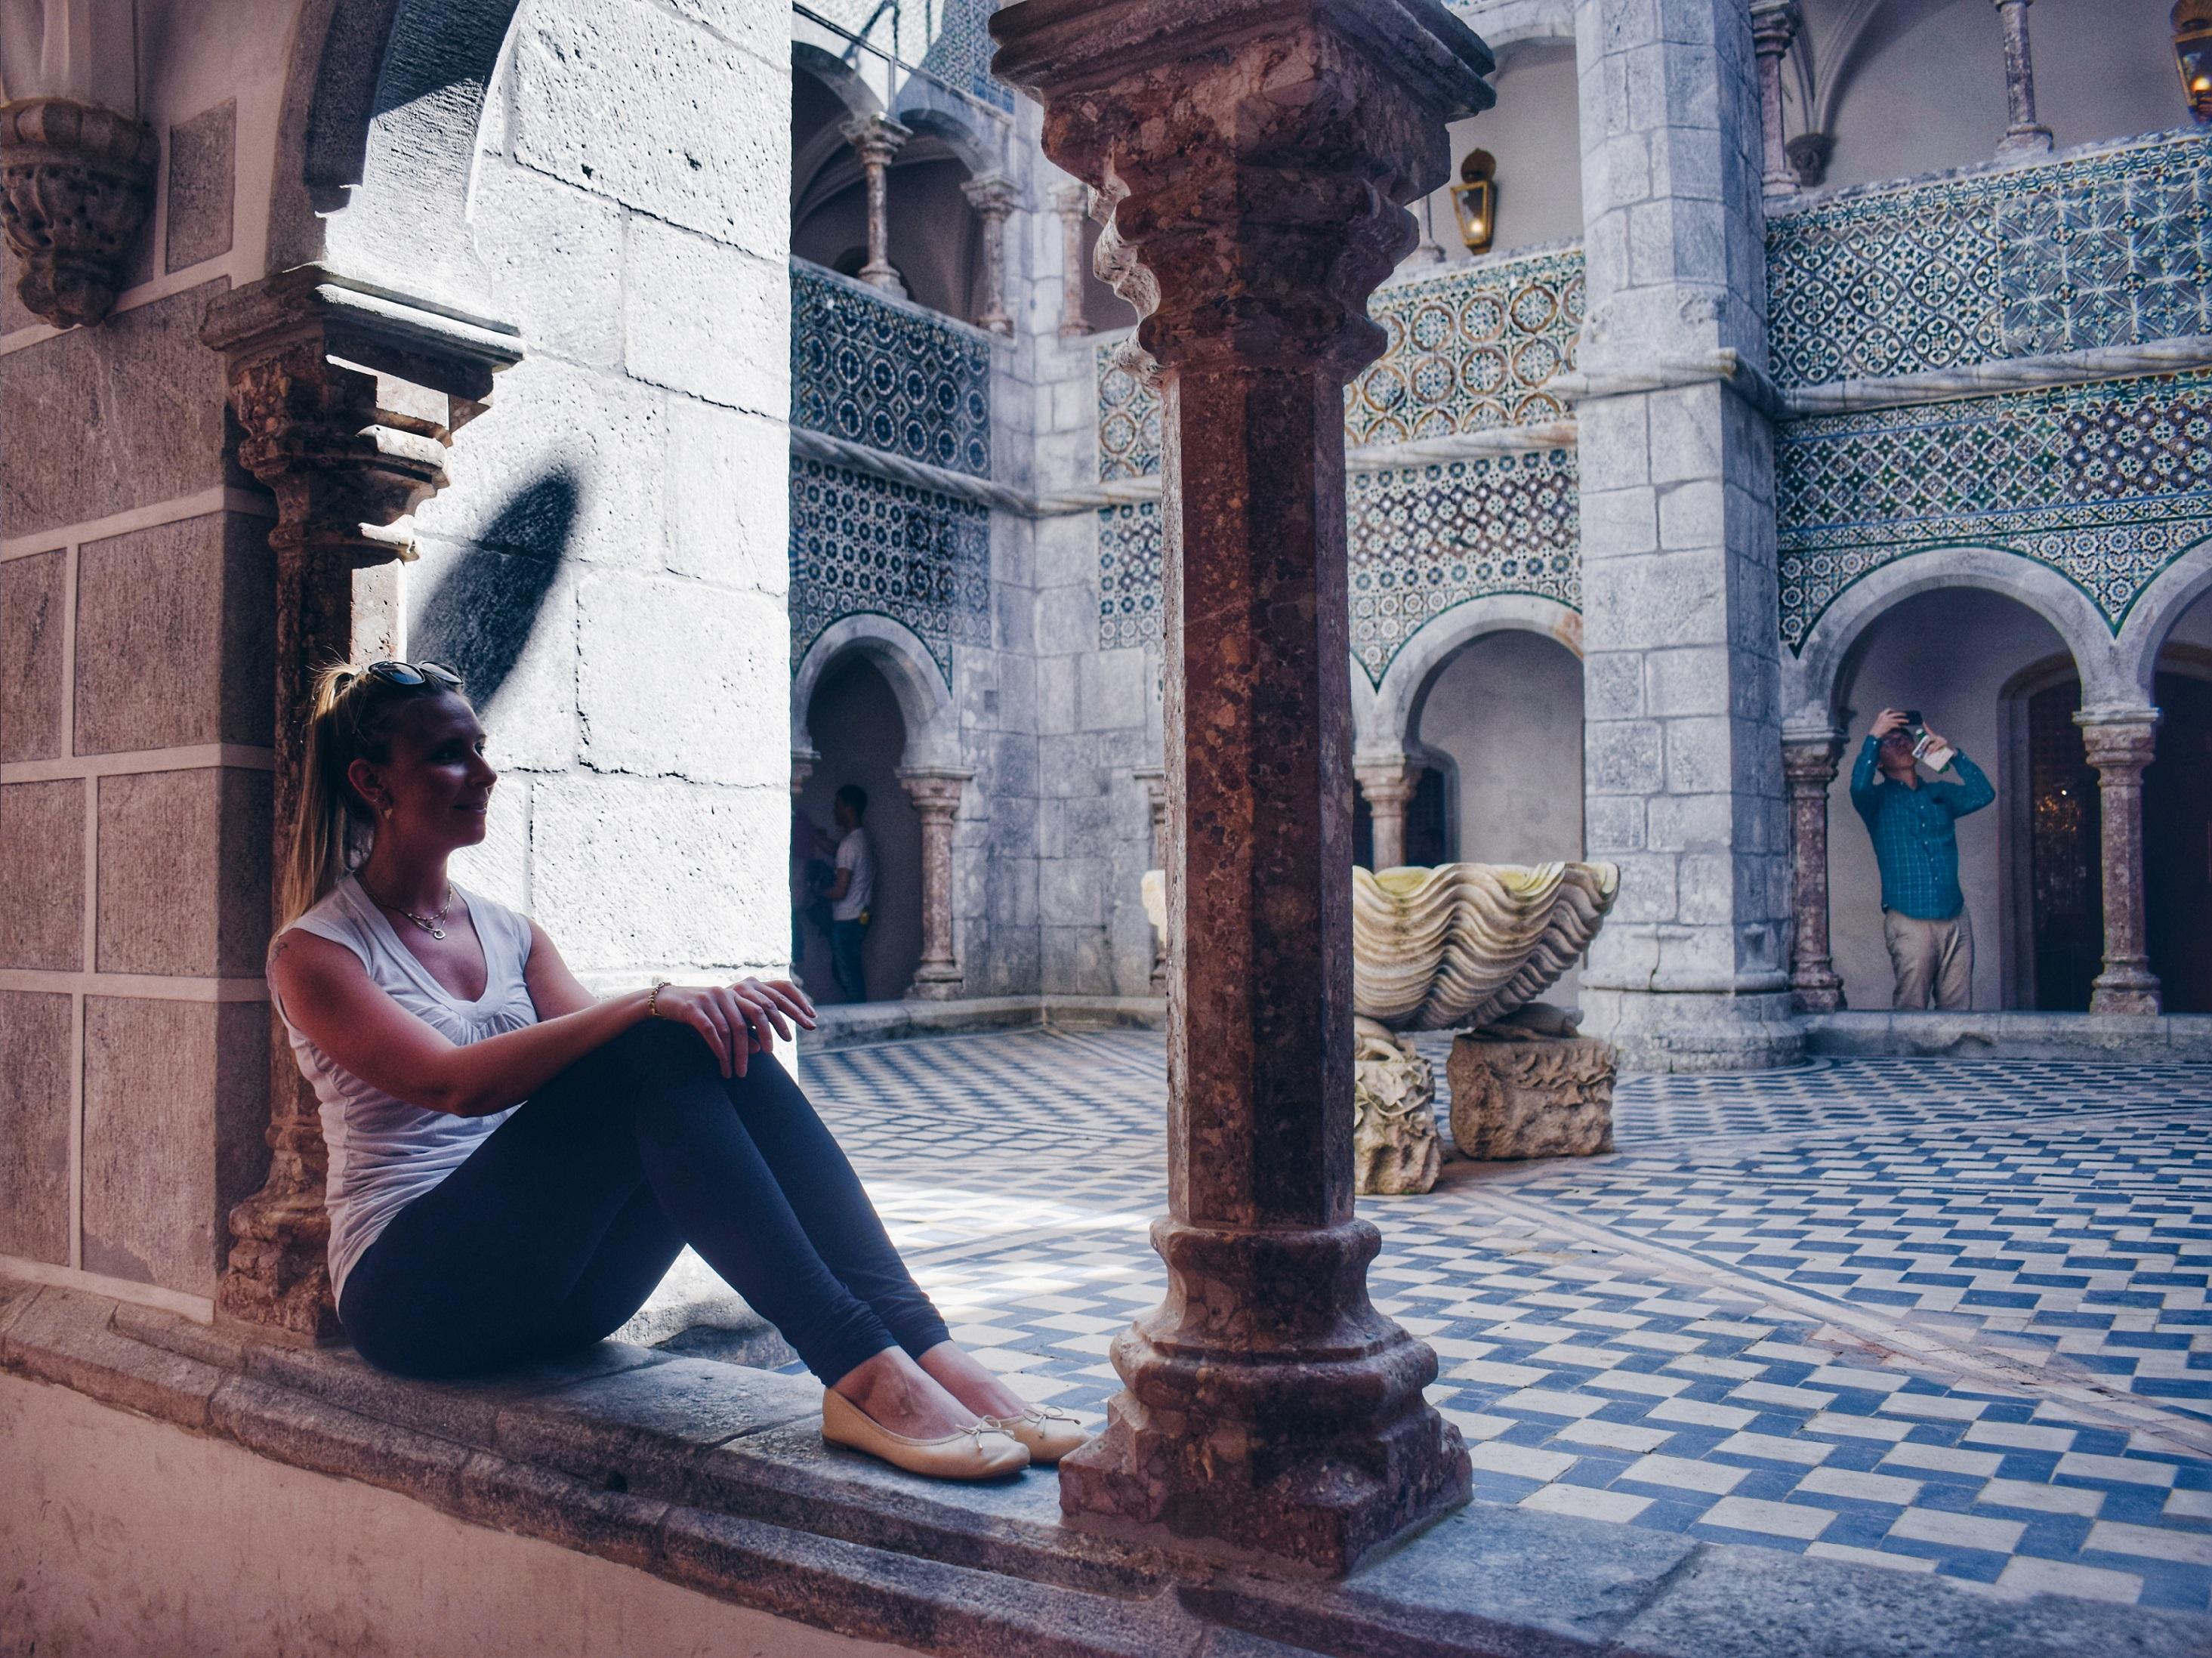 safety women traveling alone